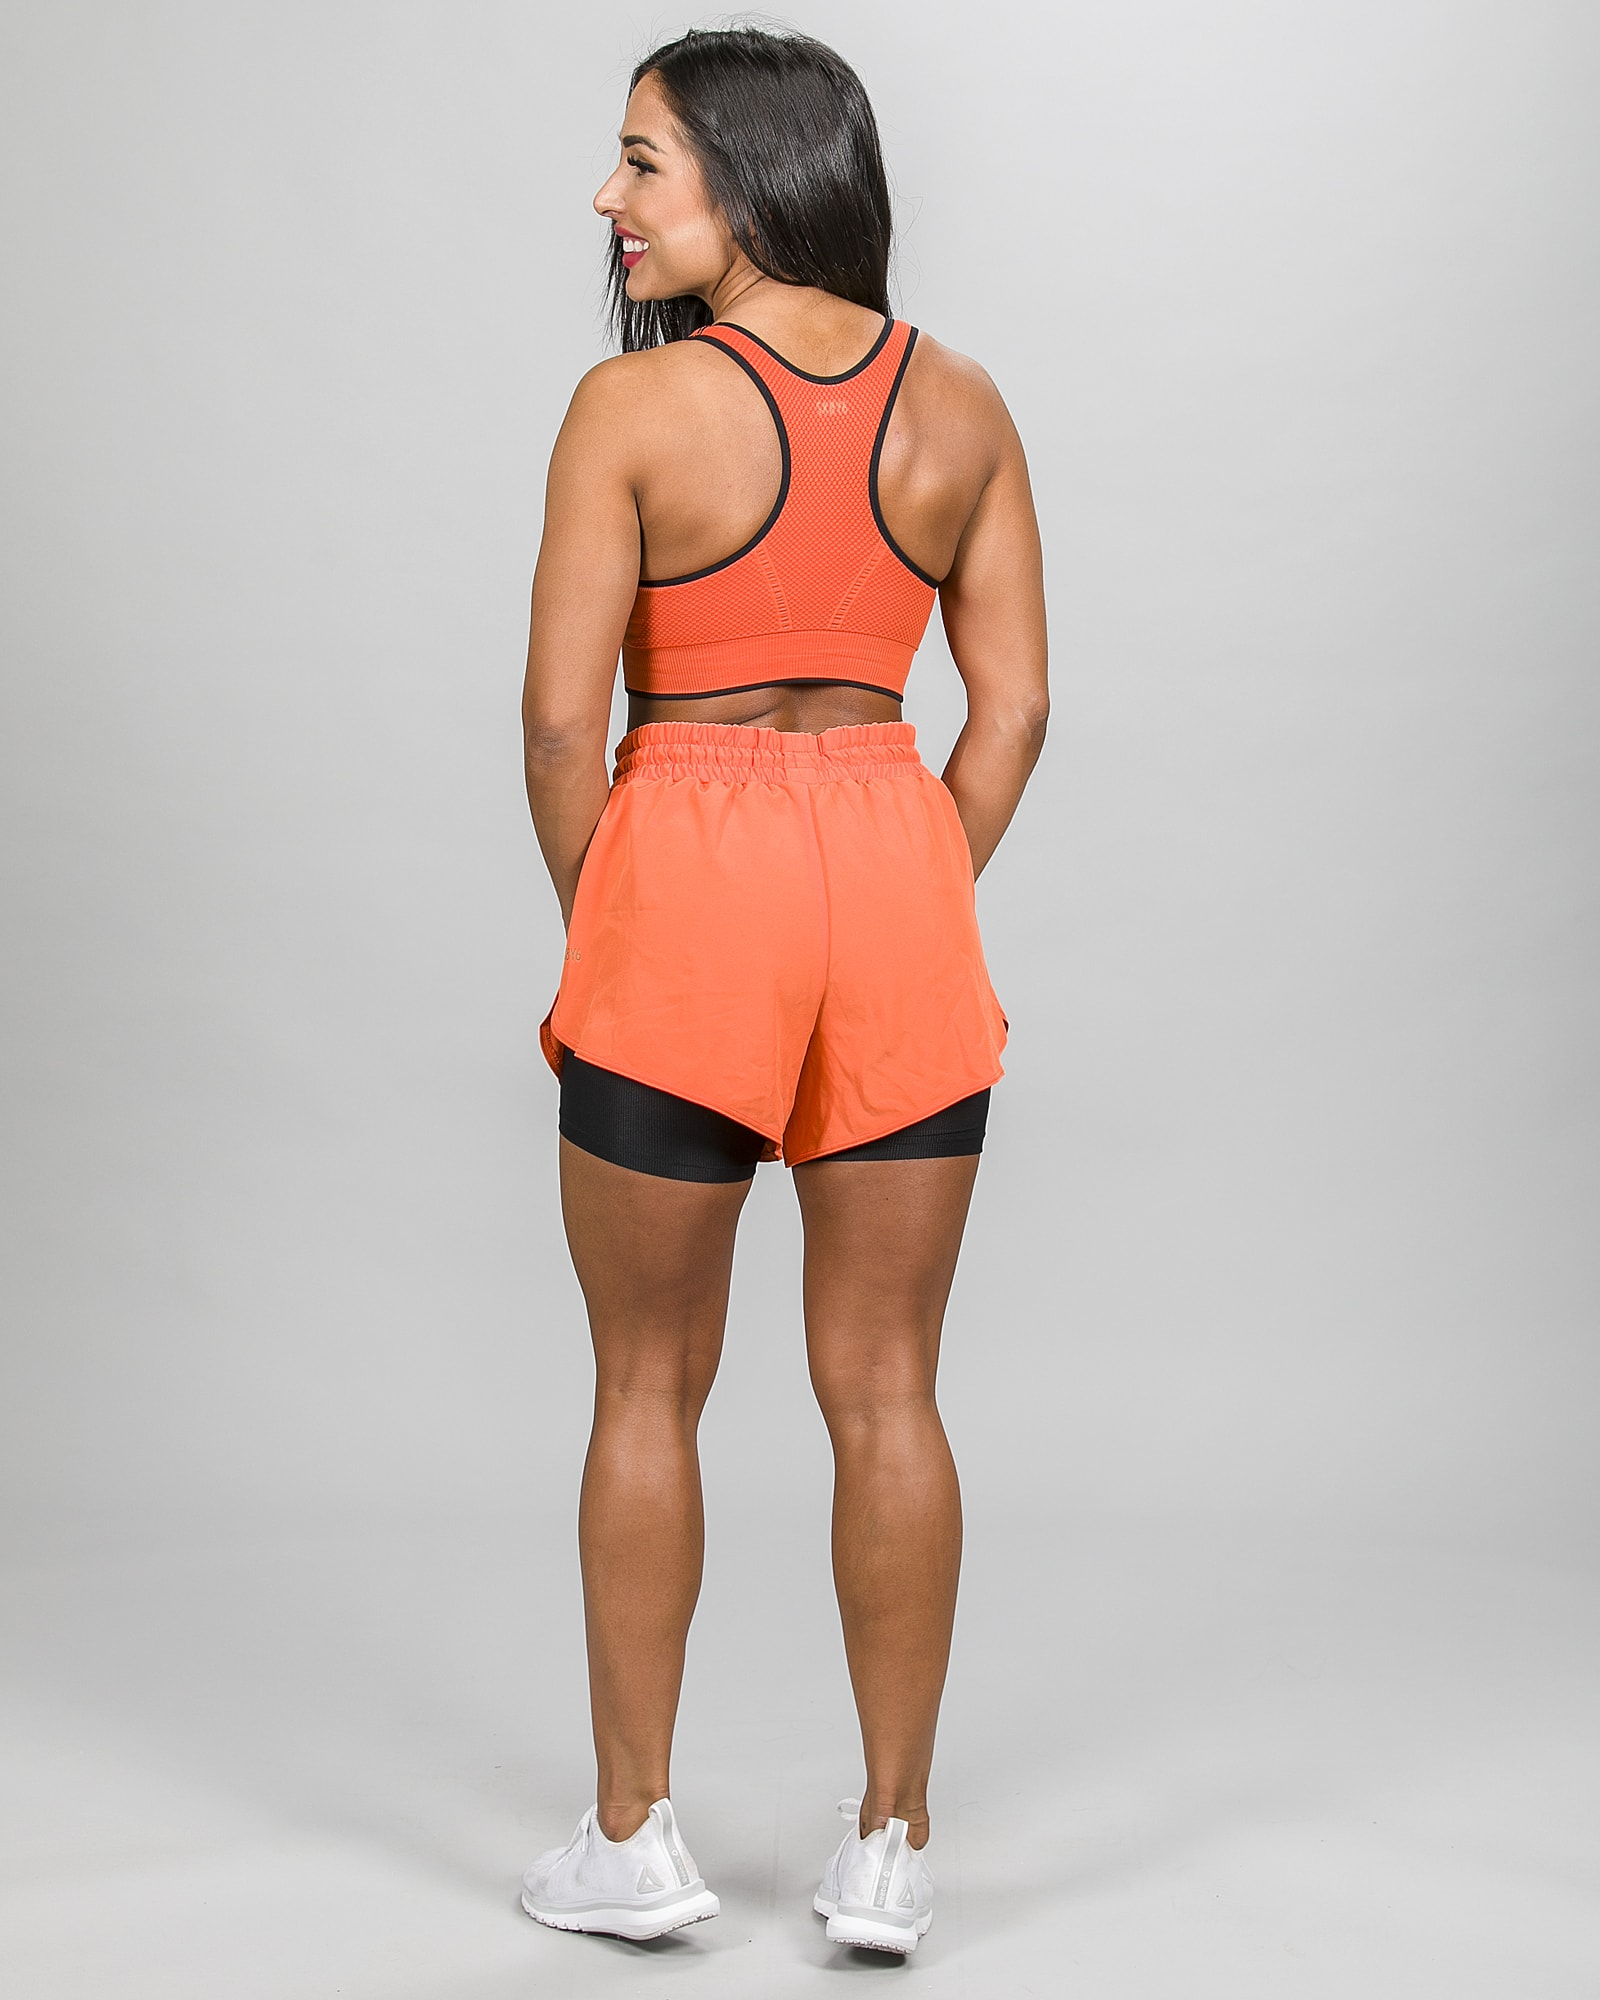 Skiny SK86 Shorts 083111and Crop Top 083094- Blazing Orange f